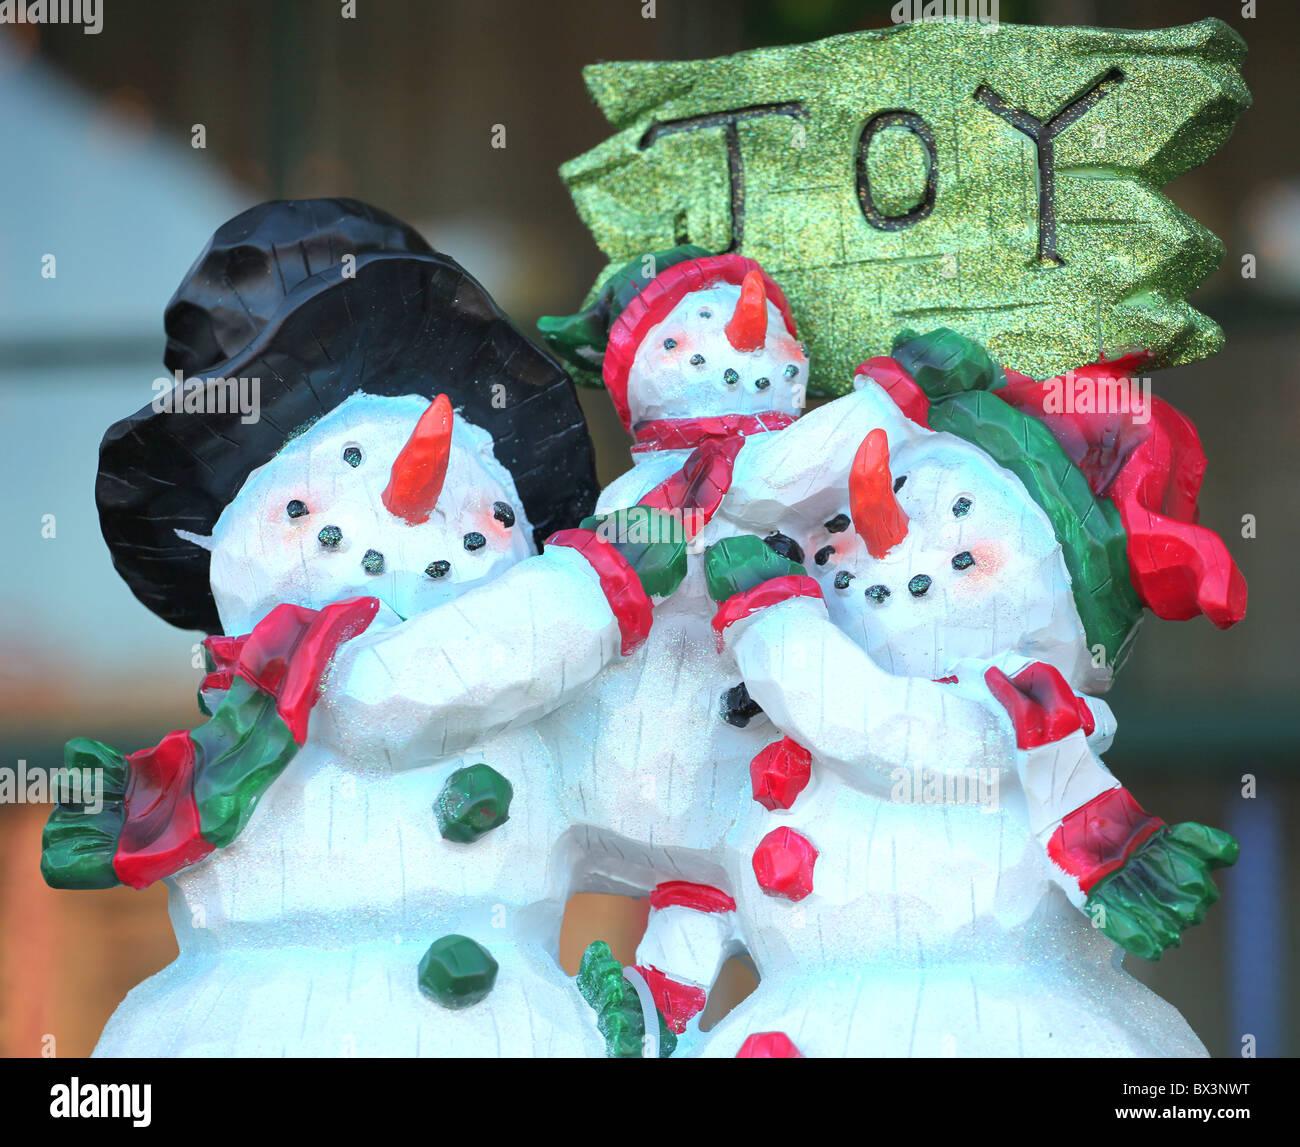 Frosty The Snowman Santa Stock Photos & Frosty The Snowman Santa ...